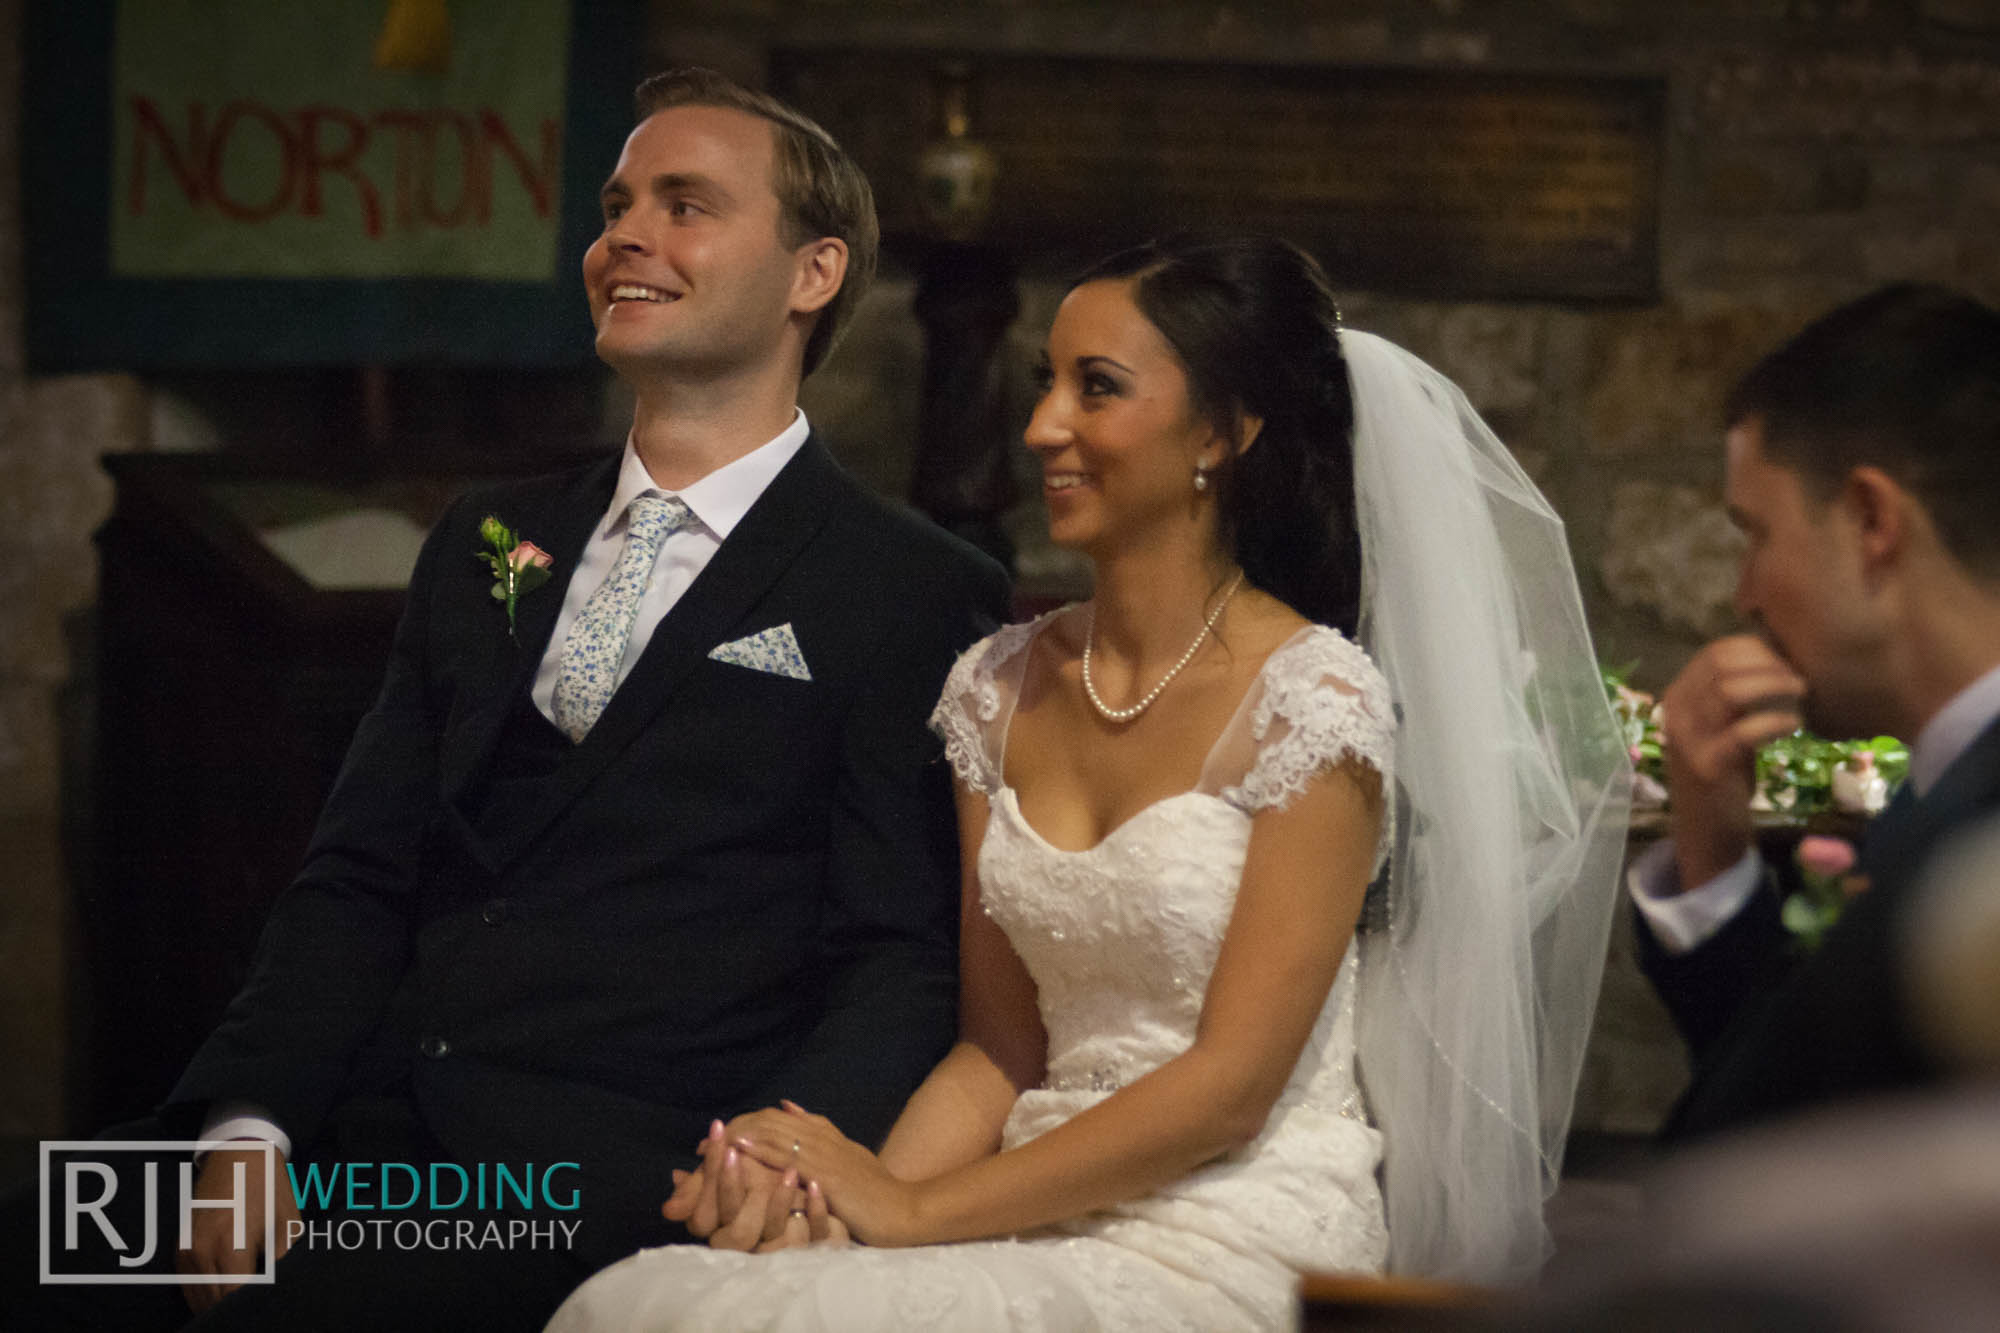 RJH Wedding Photography_Tankersley Manor Wedding_24.jpg